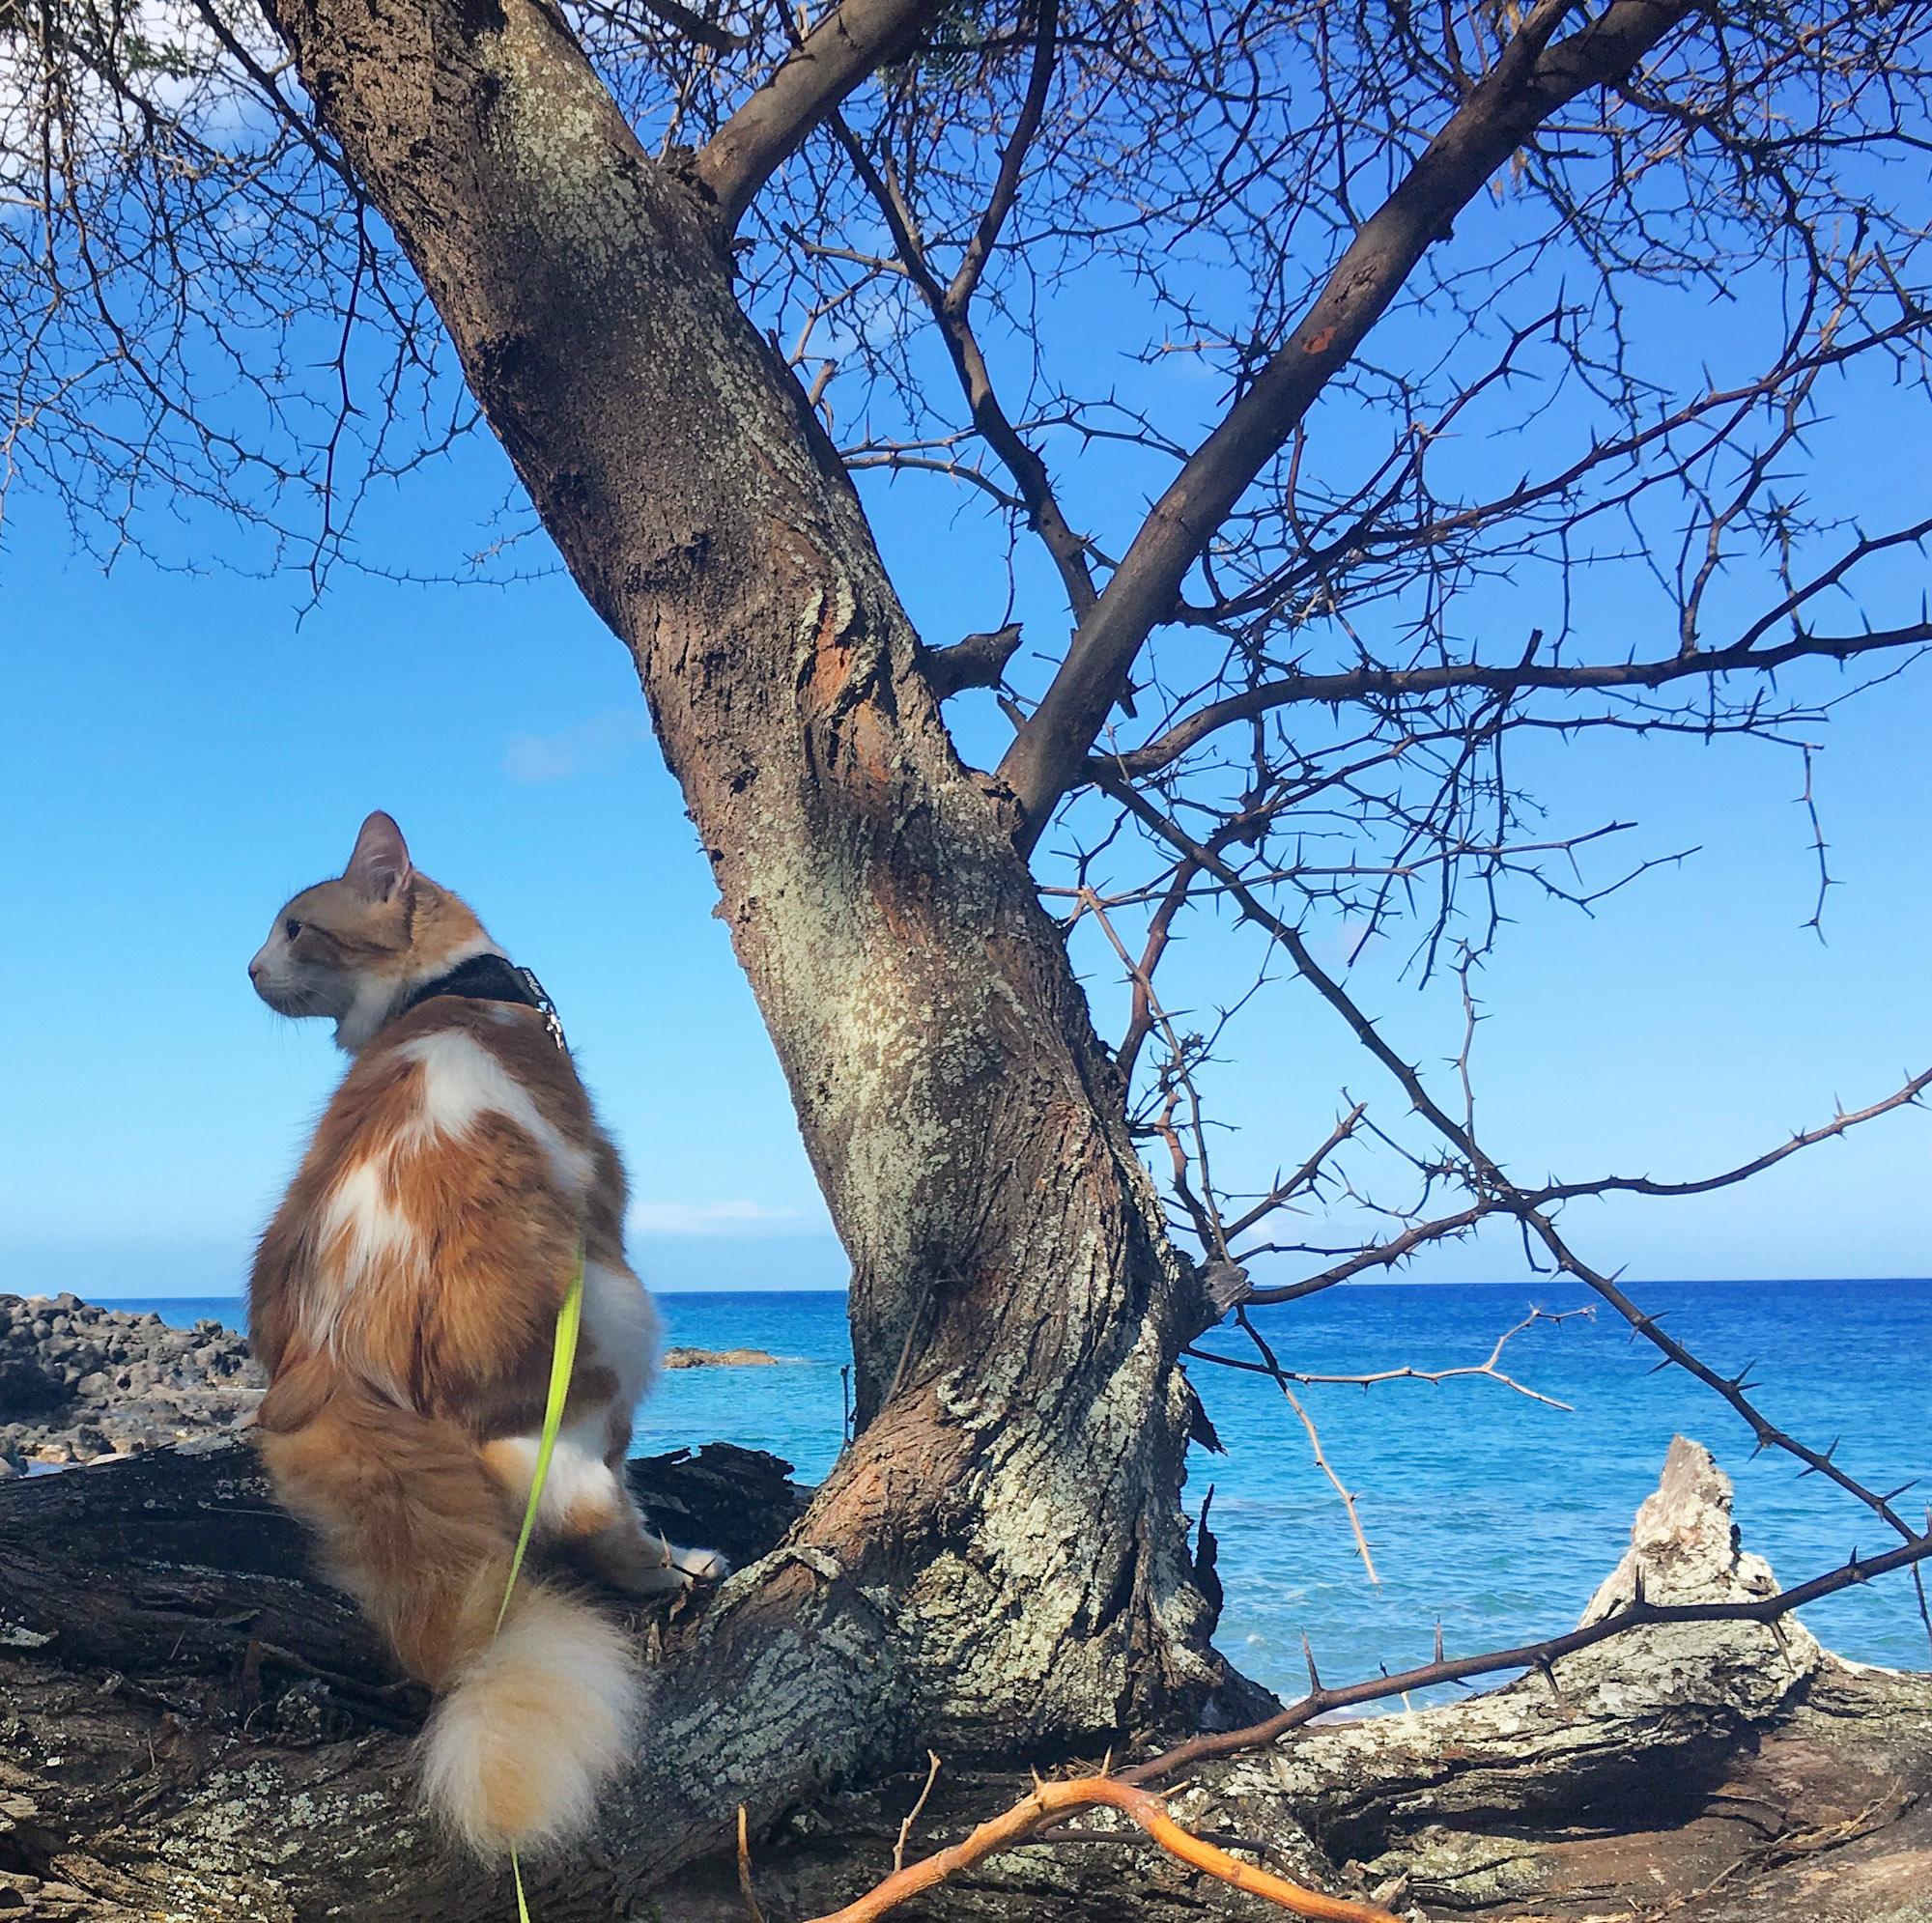 adventure cat looking at ocean